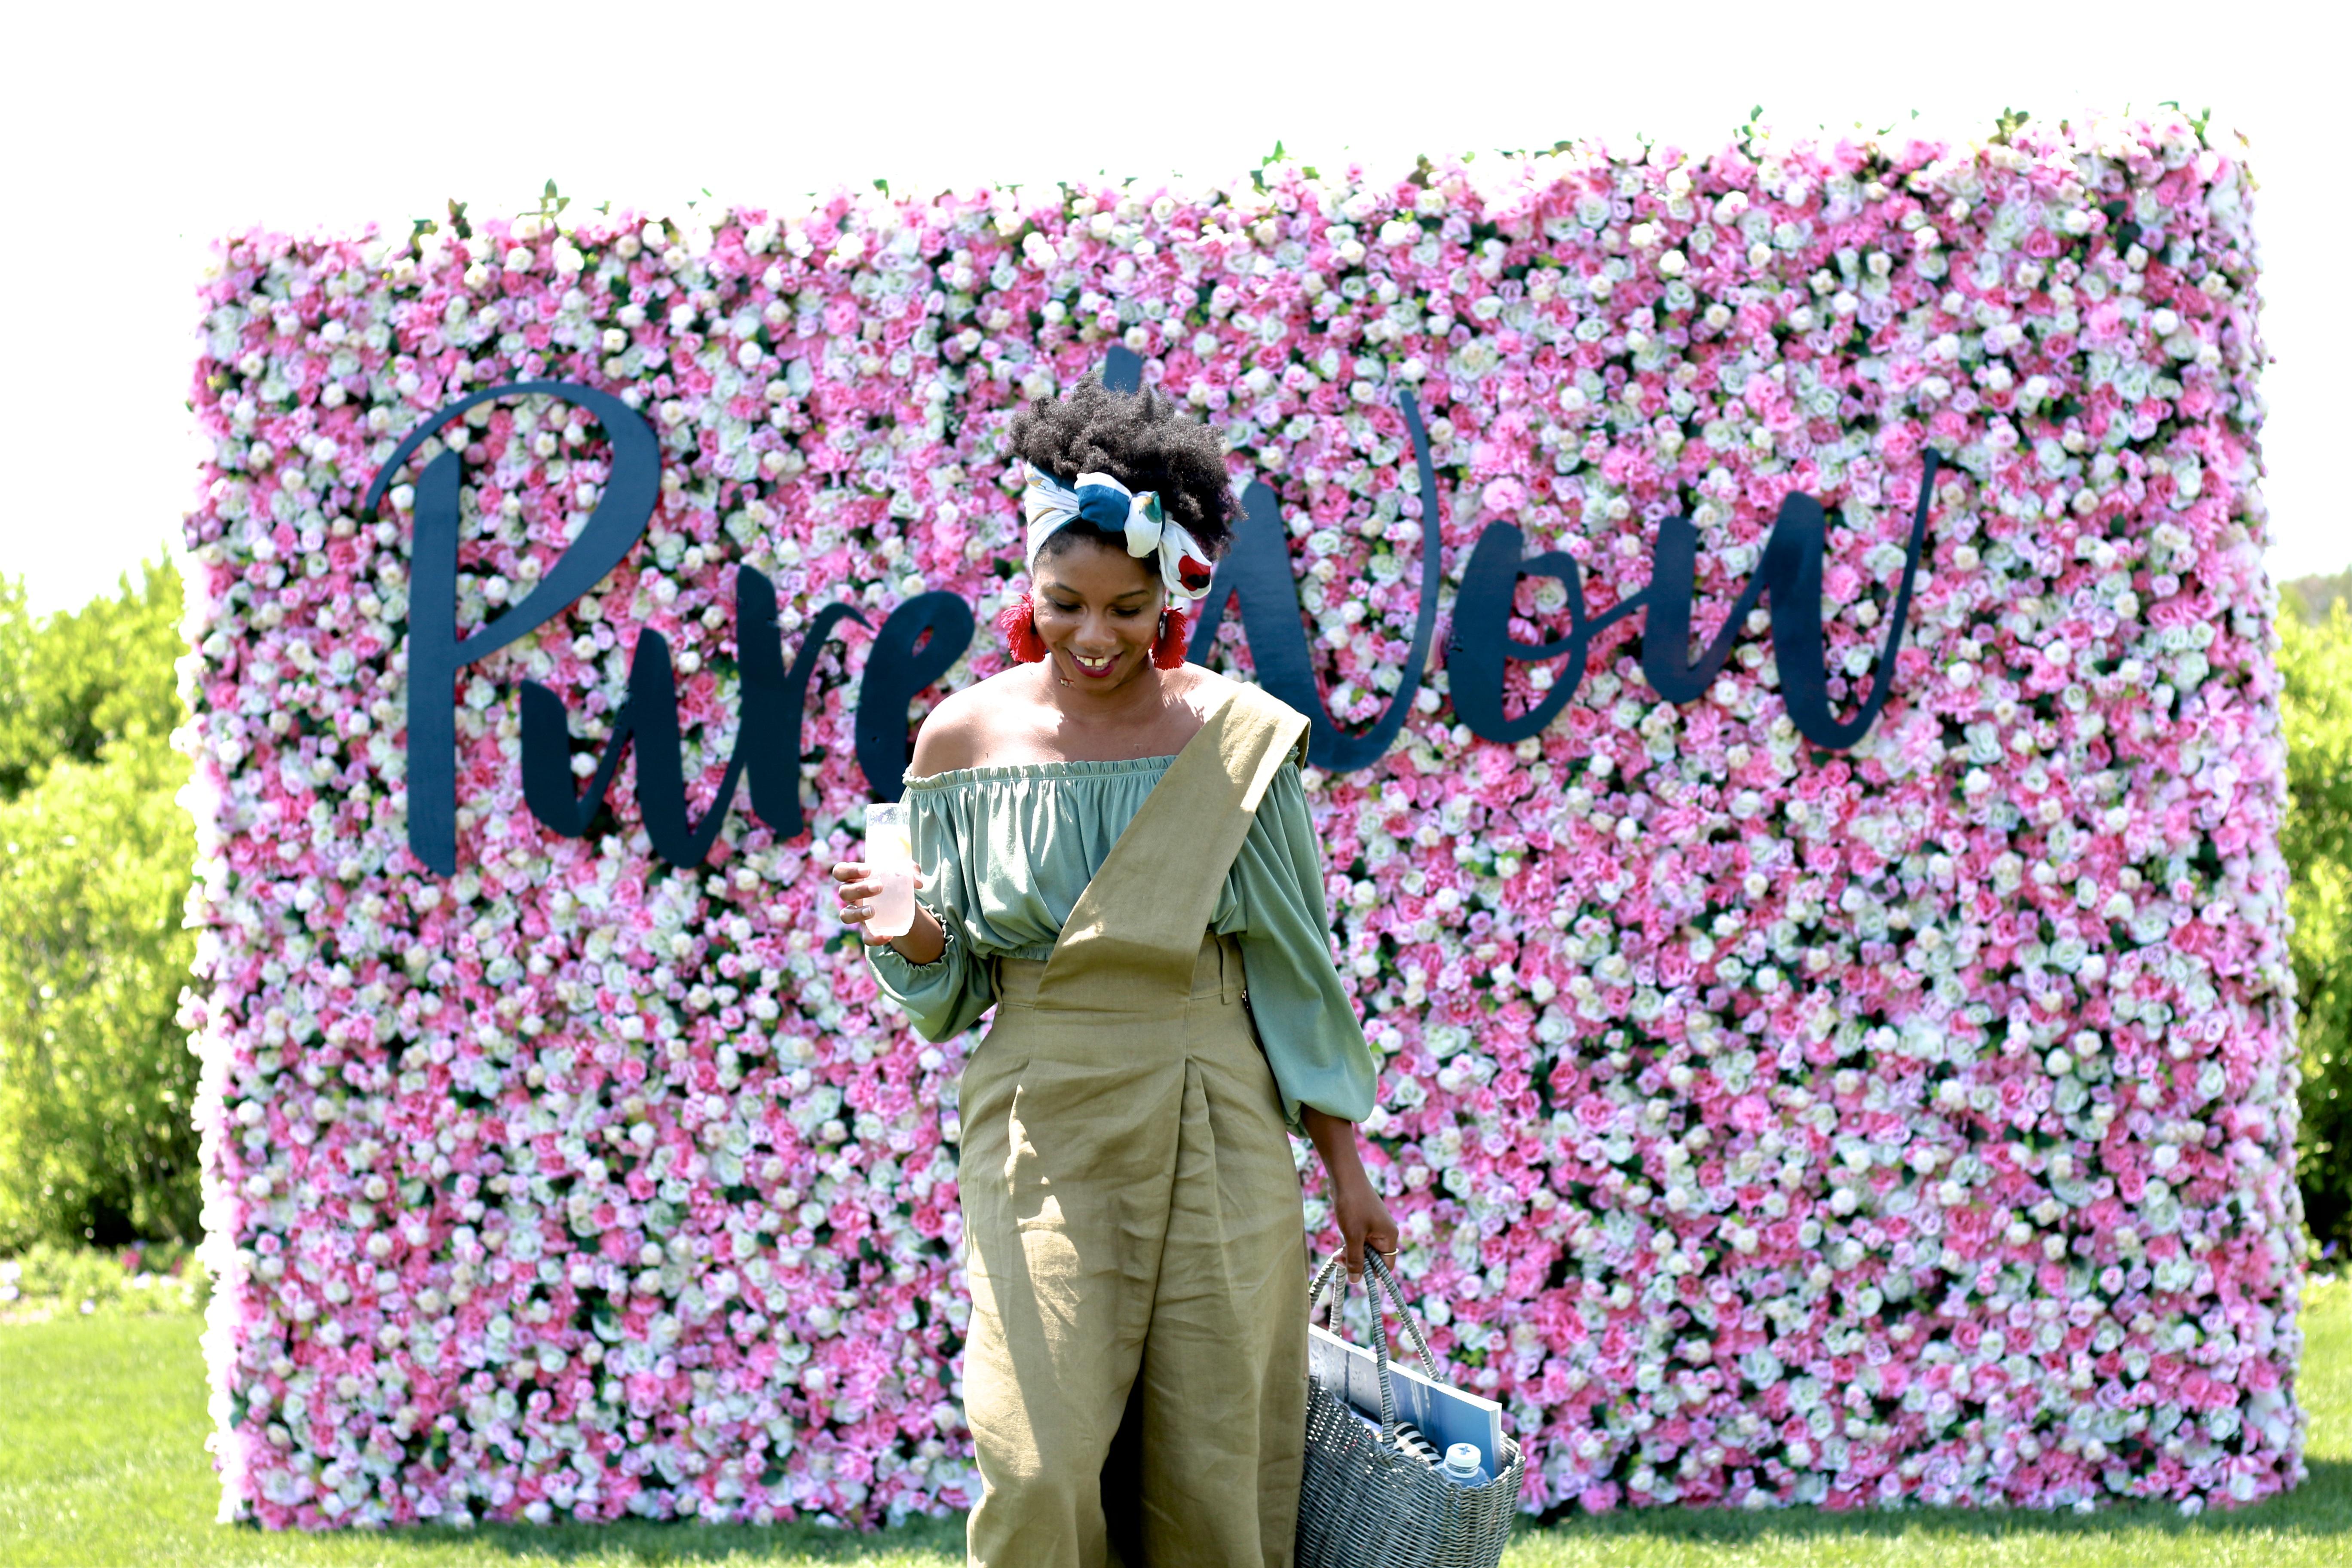 dd96b7ace0e PureWow in the Hamptons with Shea Moisture – Fashion Steele NYC